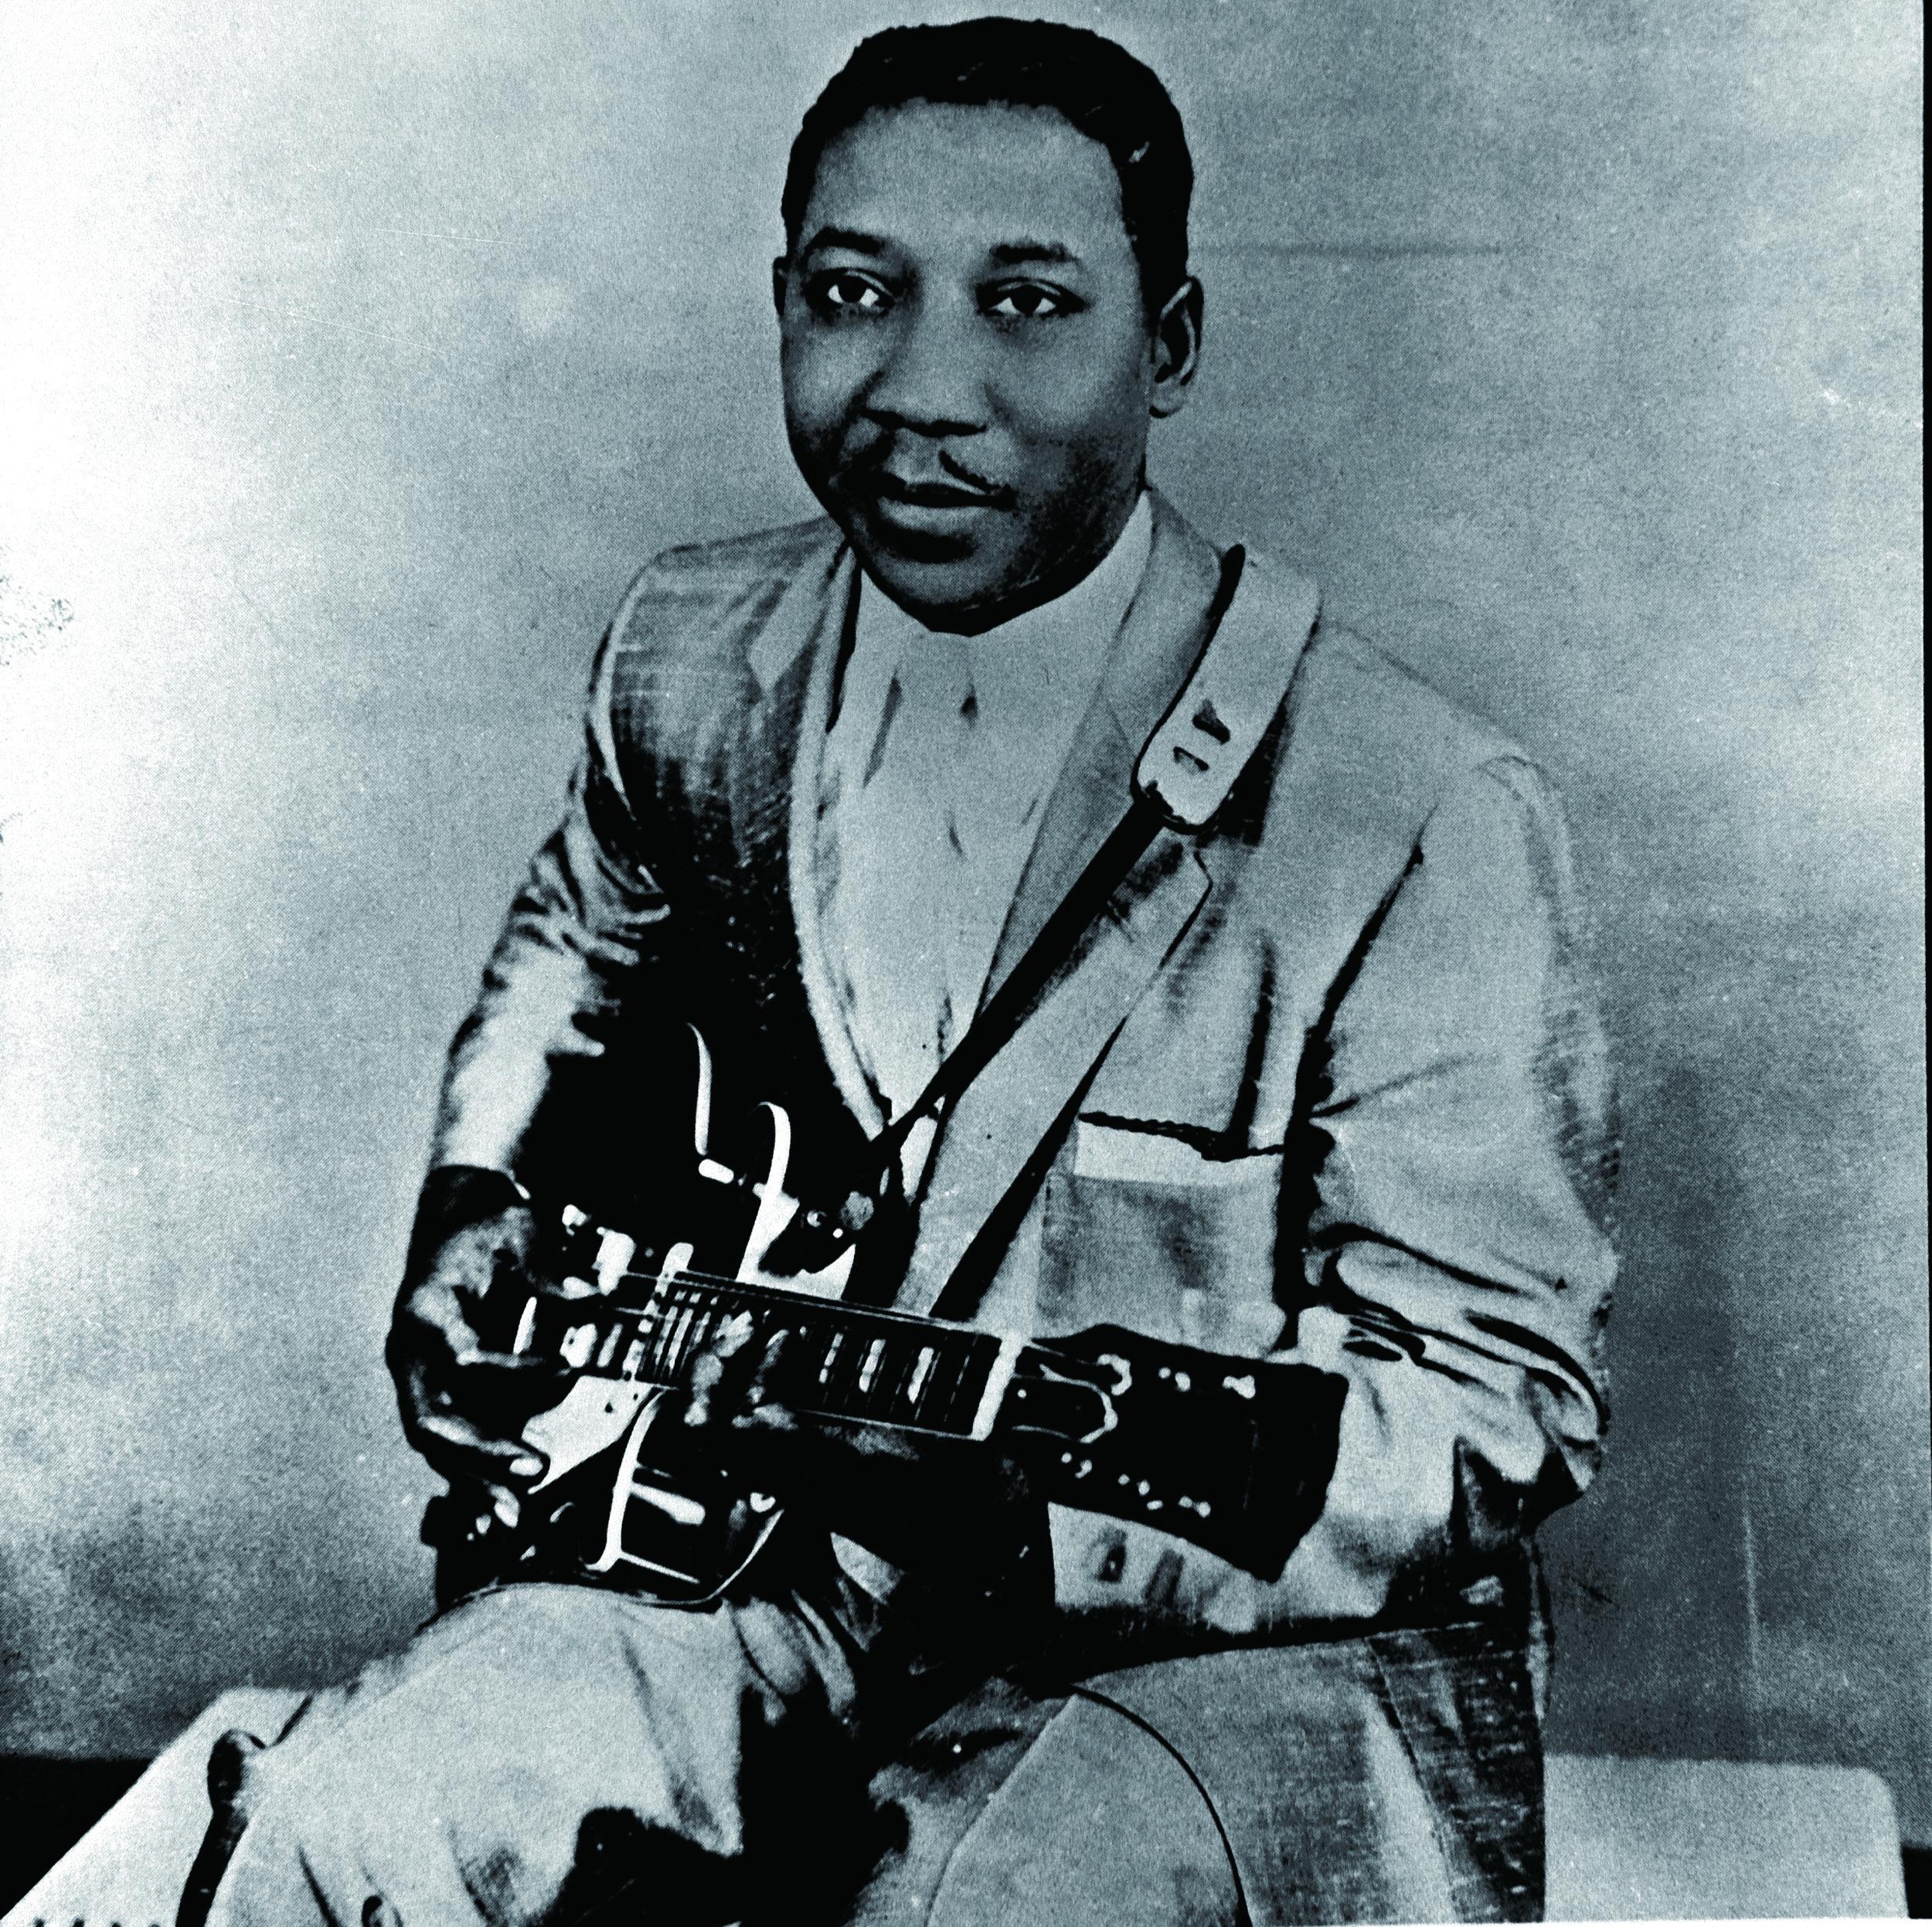 Muddy Waters (1913 - 1983)